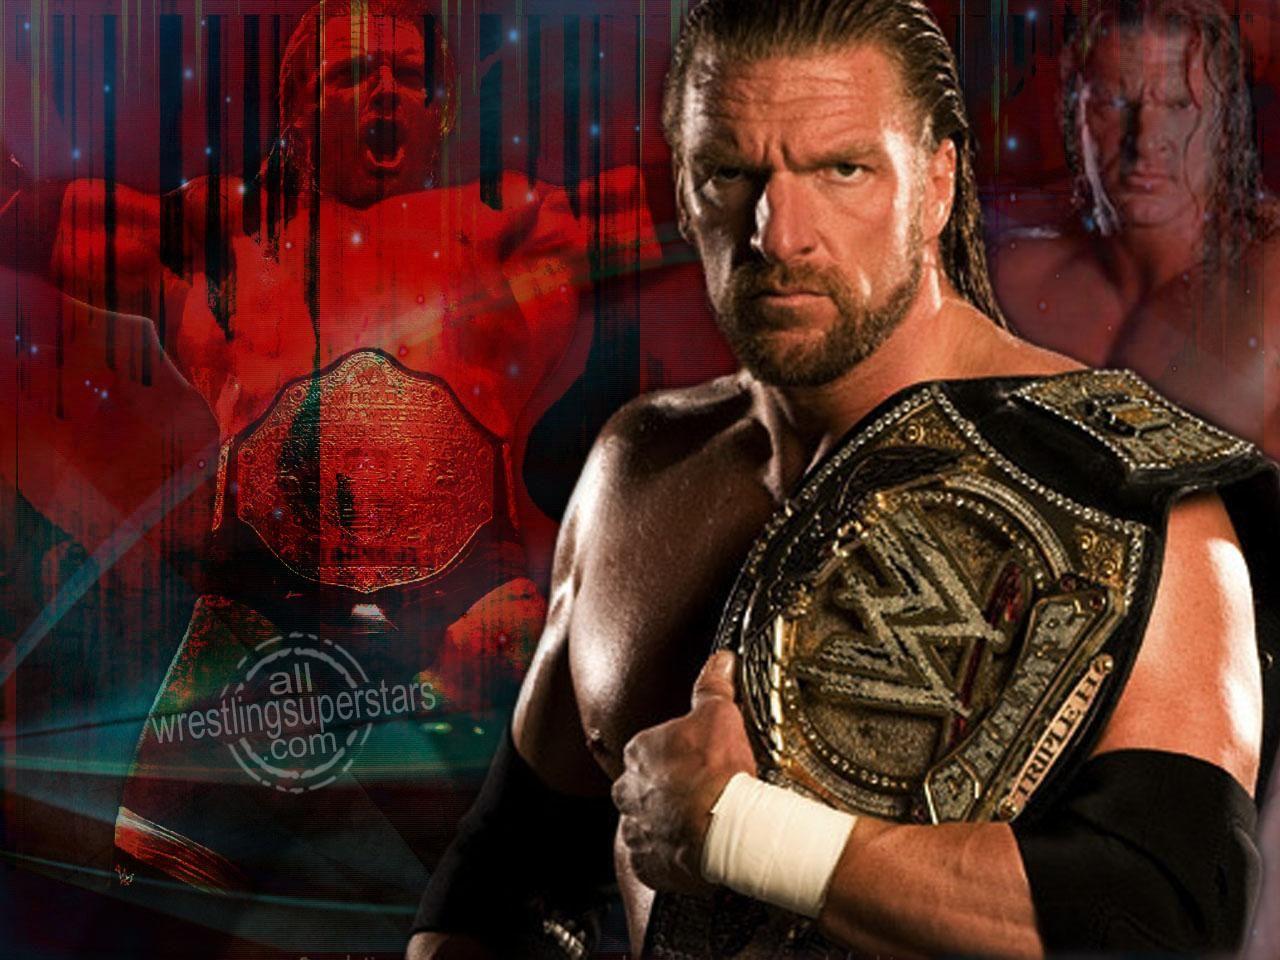 Triple H Hd Wallpapers Free Download Wwe Hd Wallpaper Free Download Triple H Wwe Wwe Legends